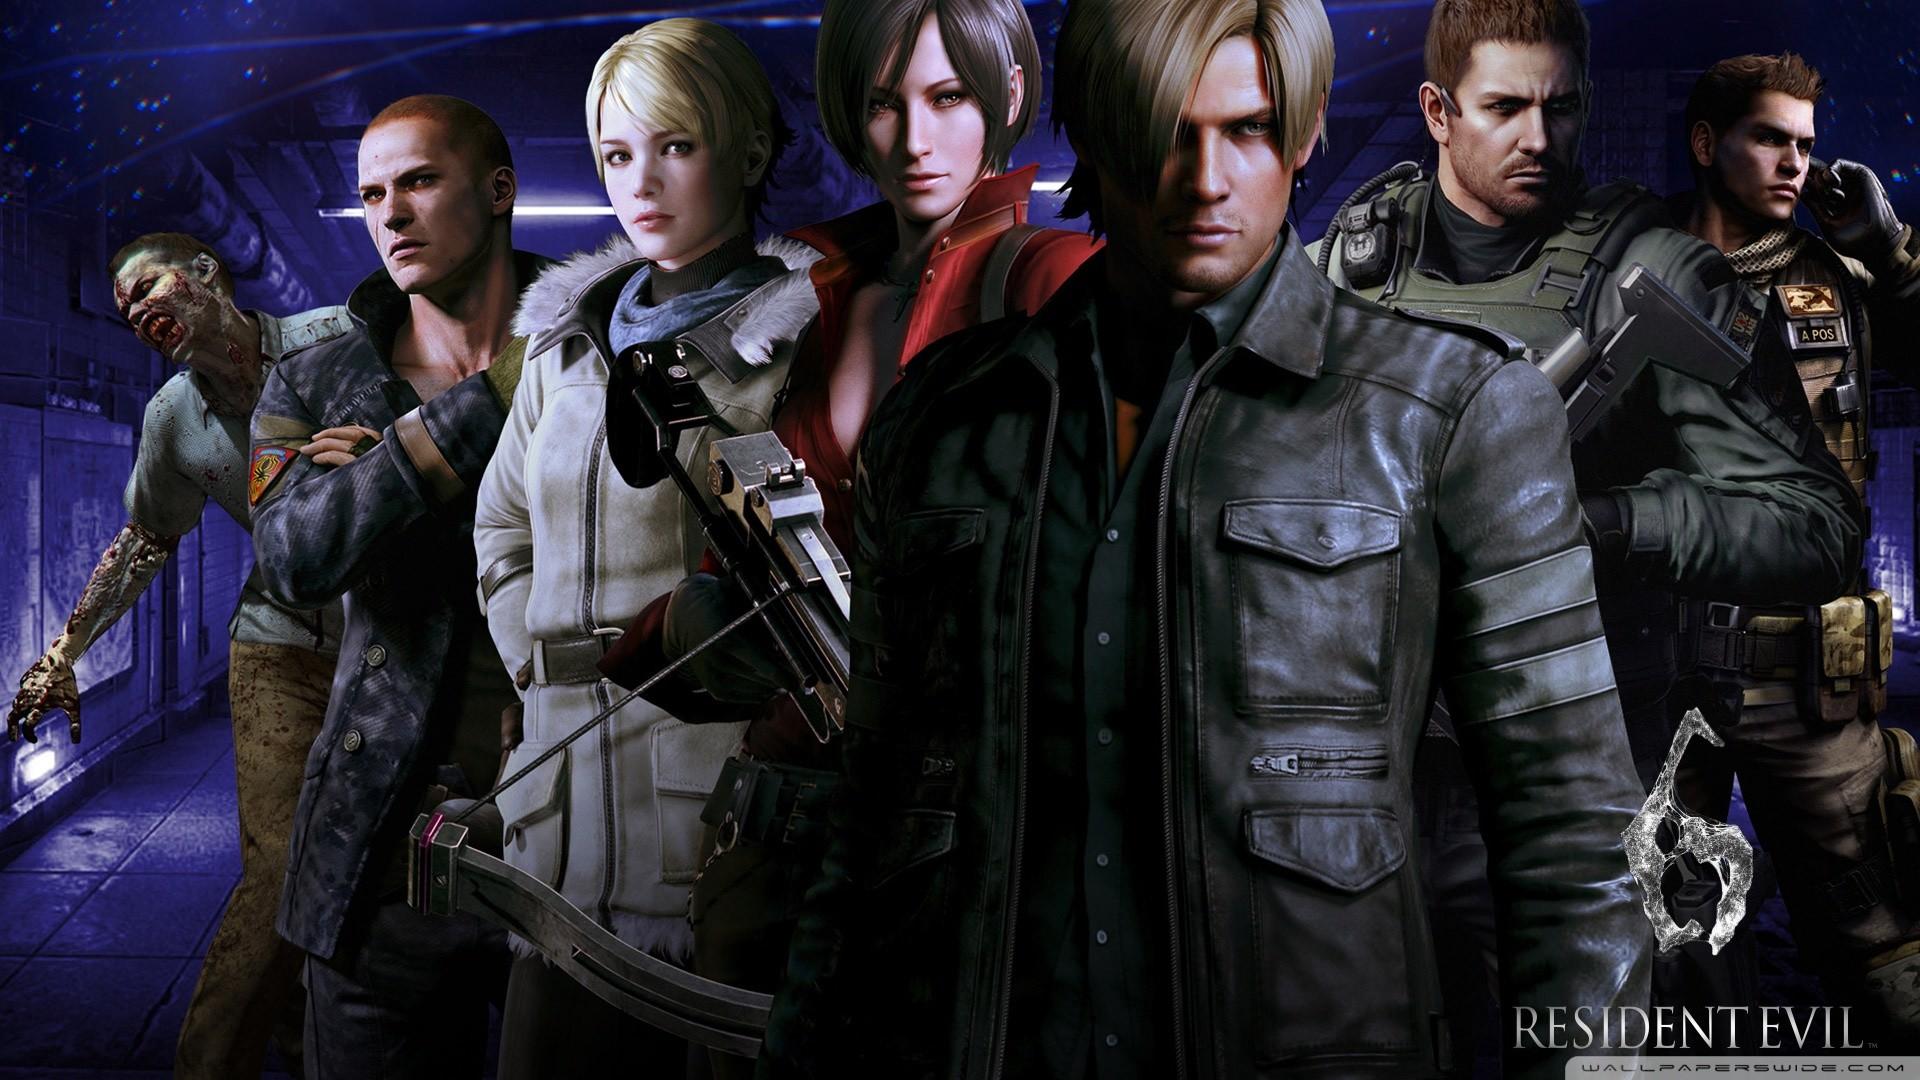 Resident Evil 6 Wallpaper Hd 1920x1080 Wallpapertag